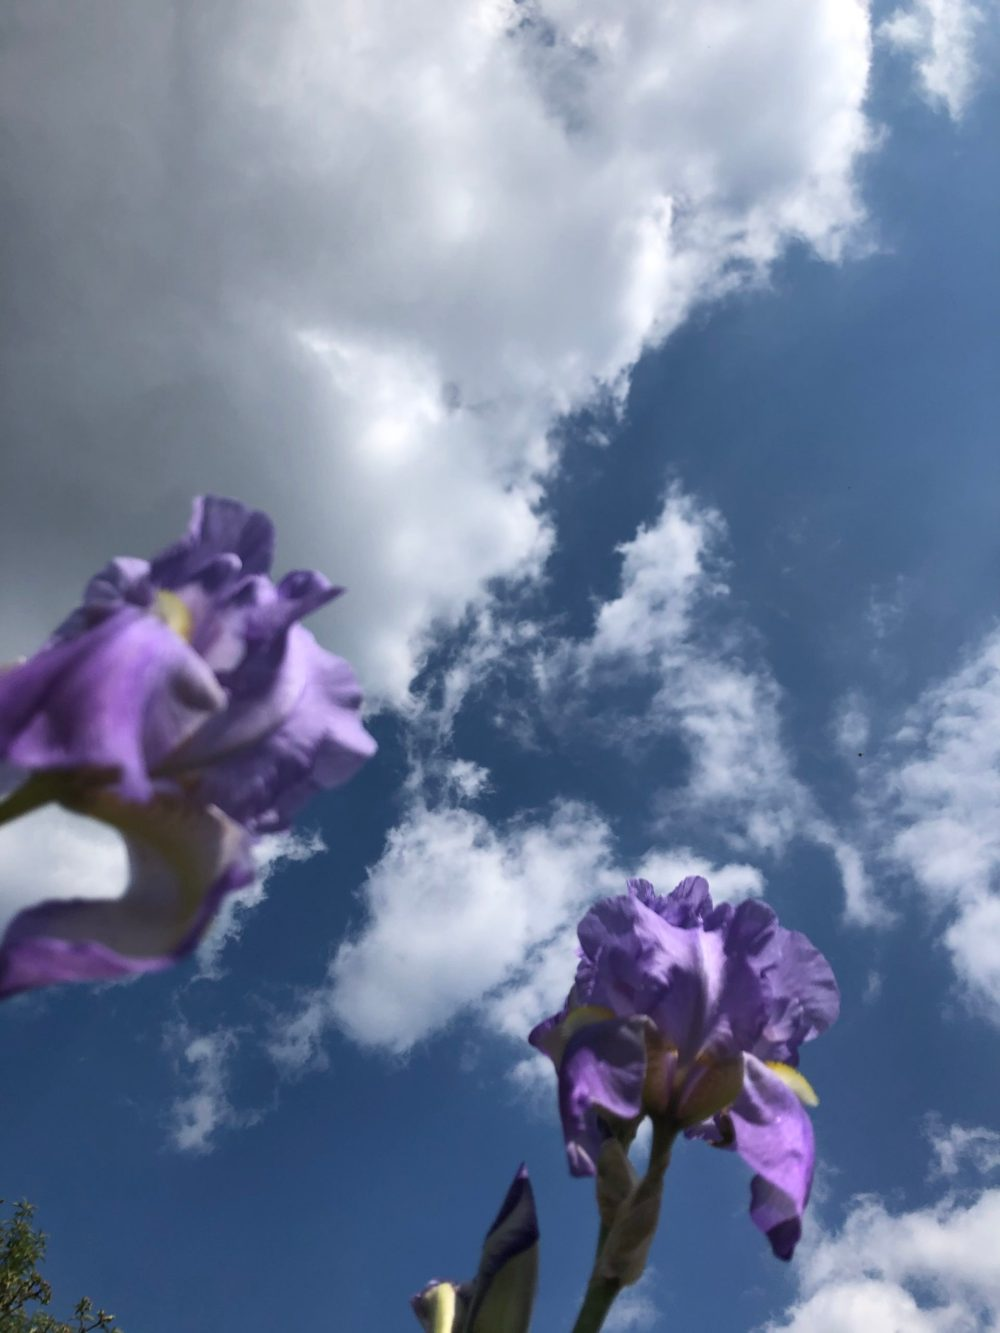 Zwei Schwertlilien unter dem bewölkten Himmel